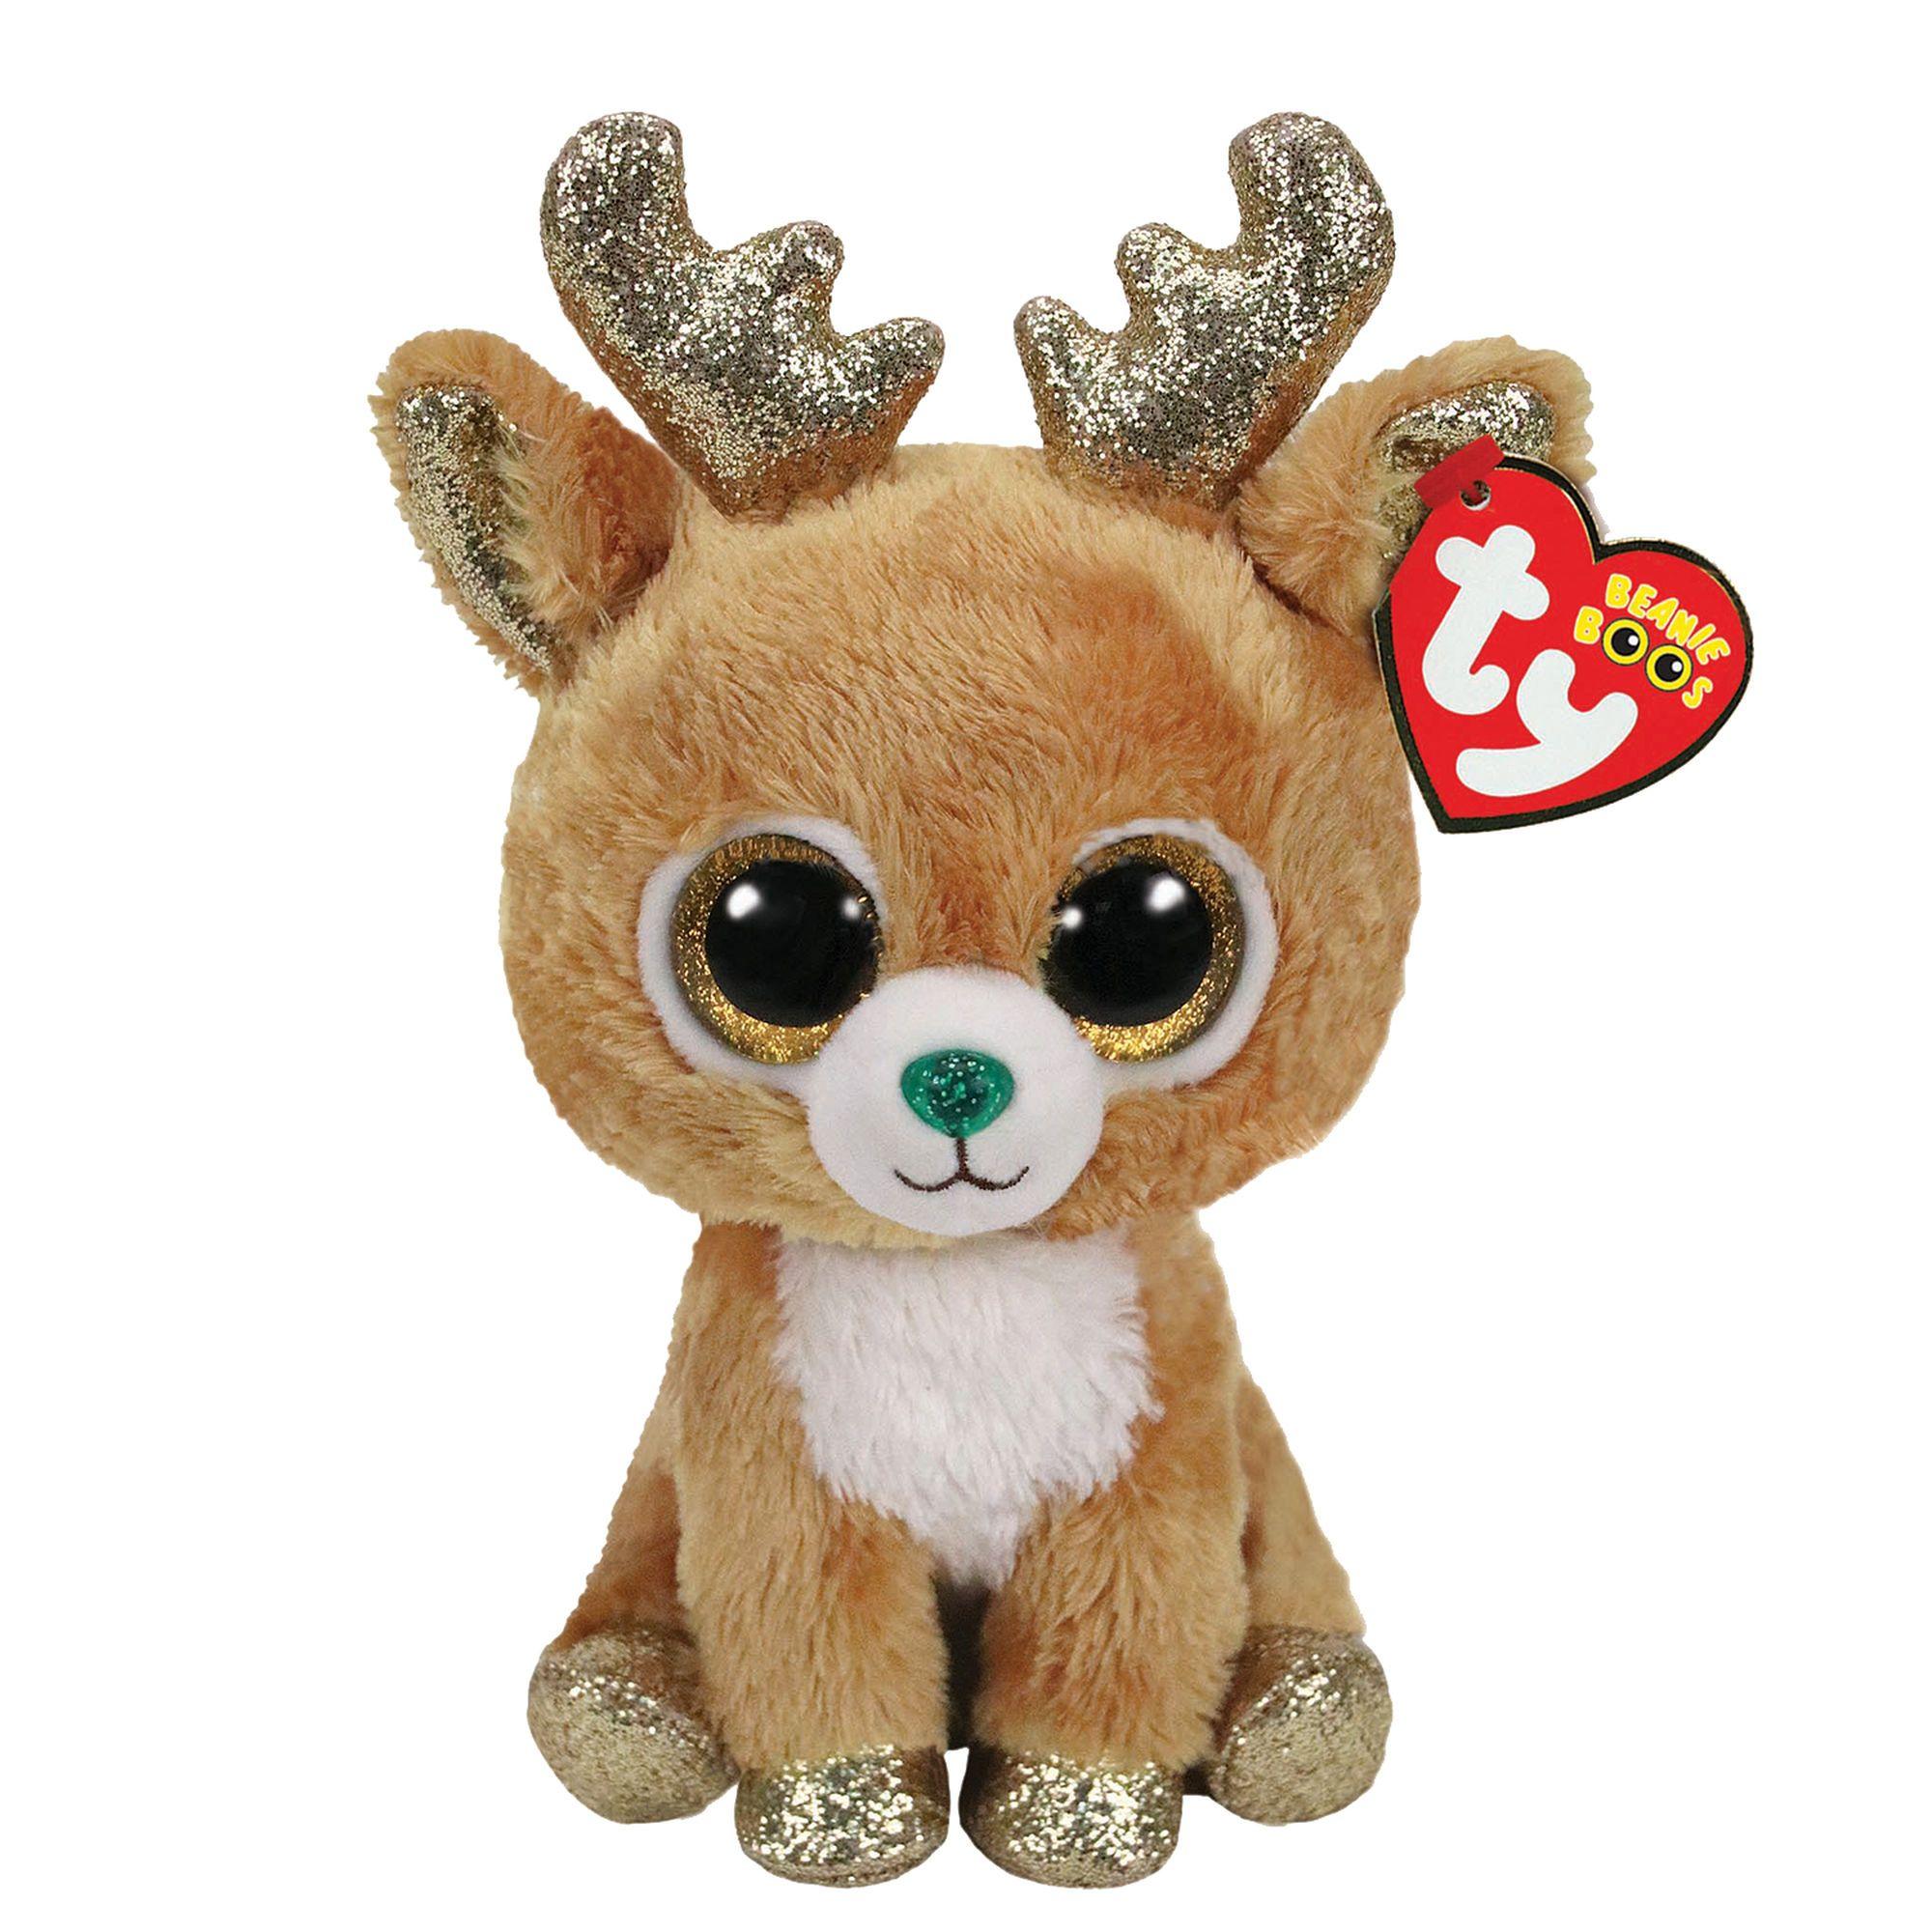 d25cb5b34eb Ty Beanie Boo Medium Glitzy the Reindeer Plush Toy